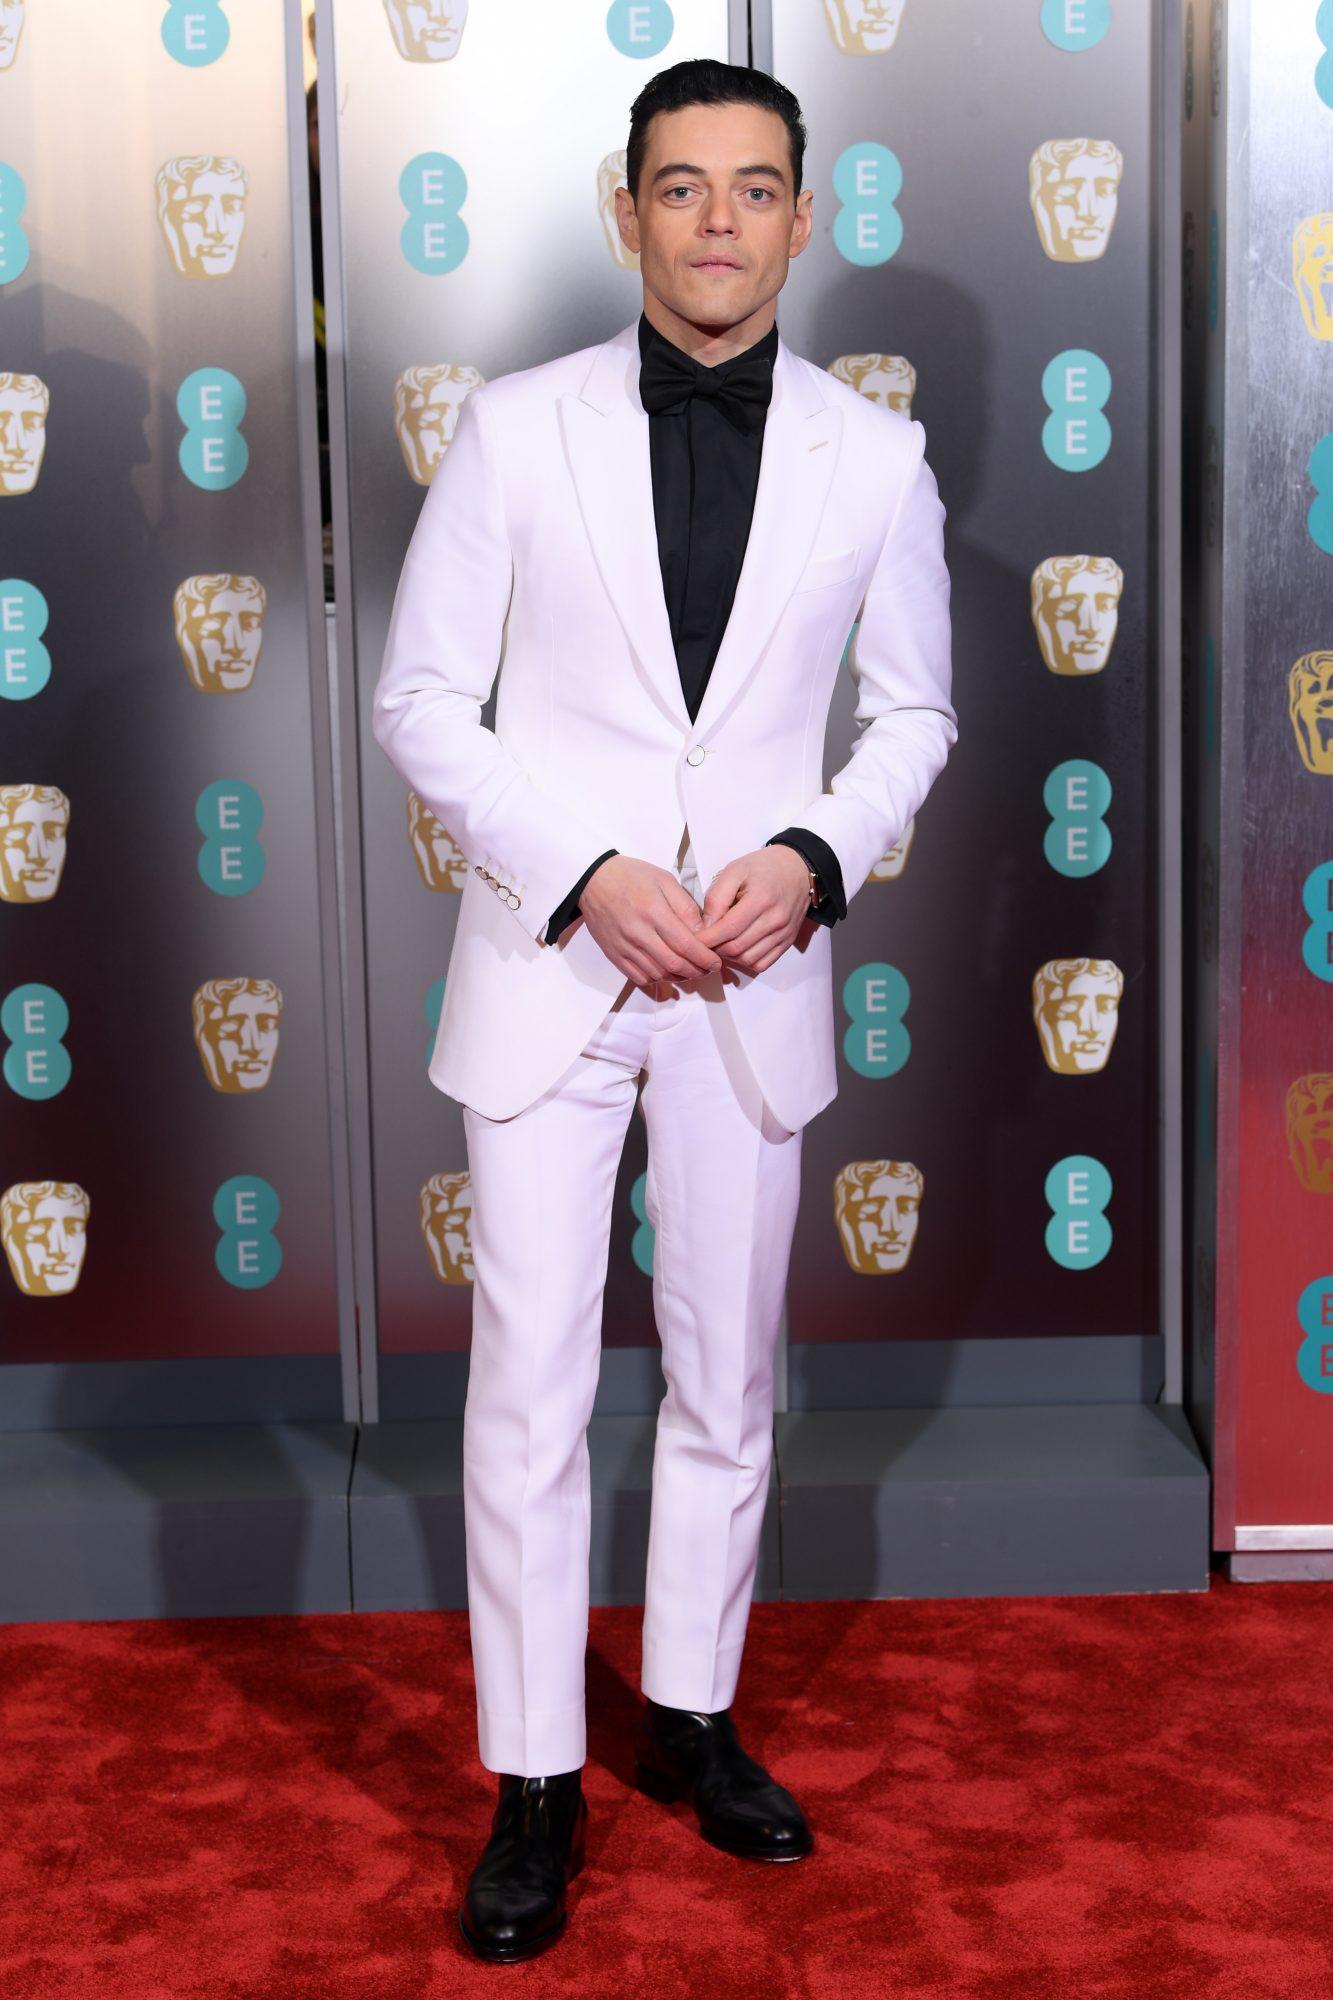 72nd British Academy Film Awards, Arrivals, Royal Albert Hall, London, UK - 10 Feb 2019